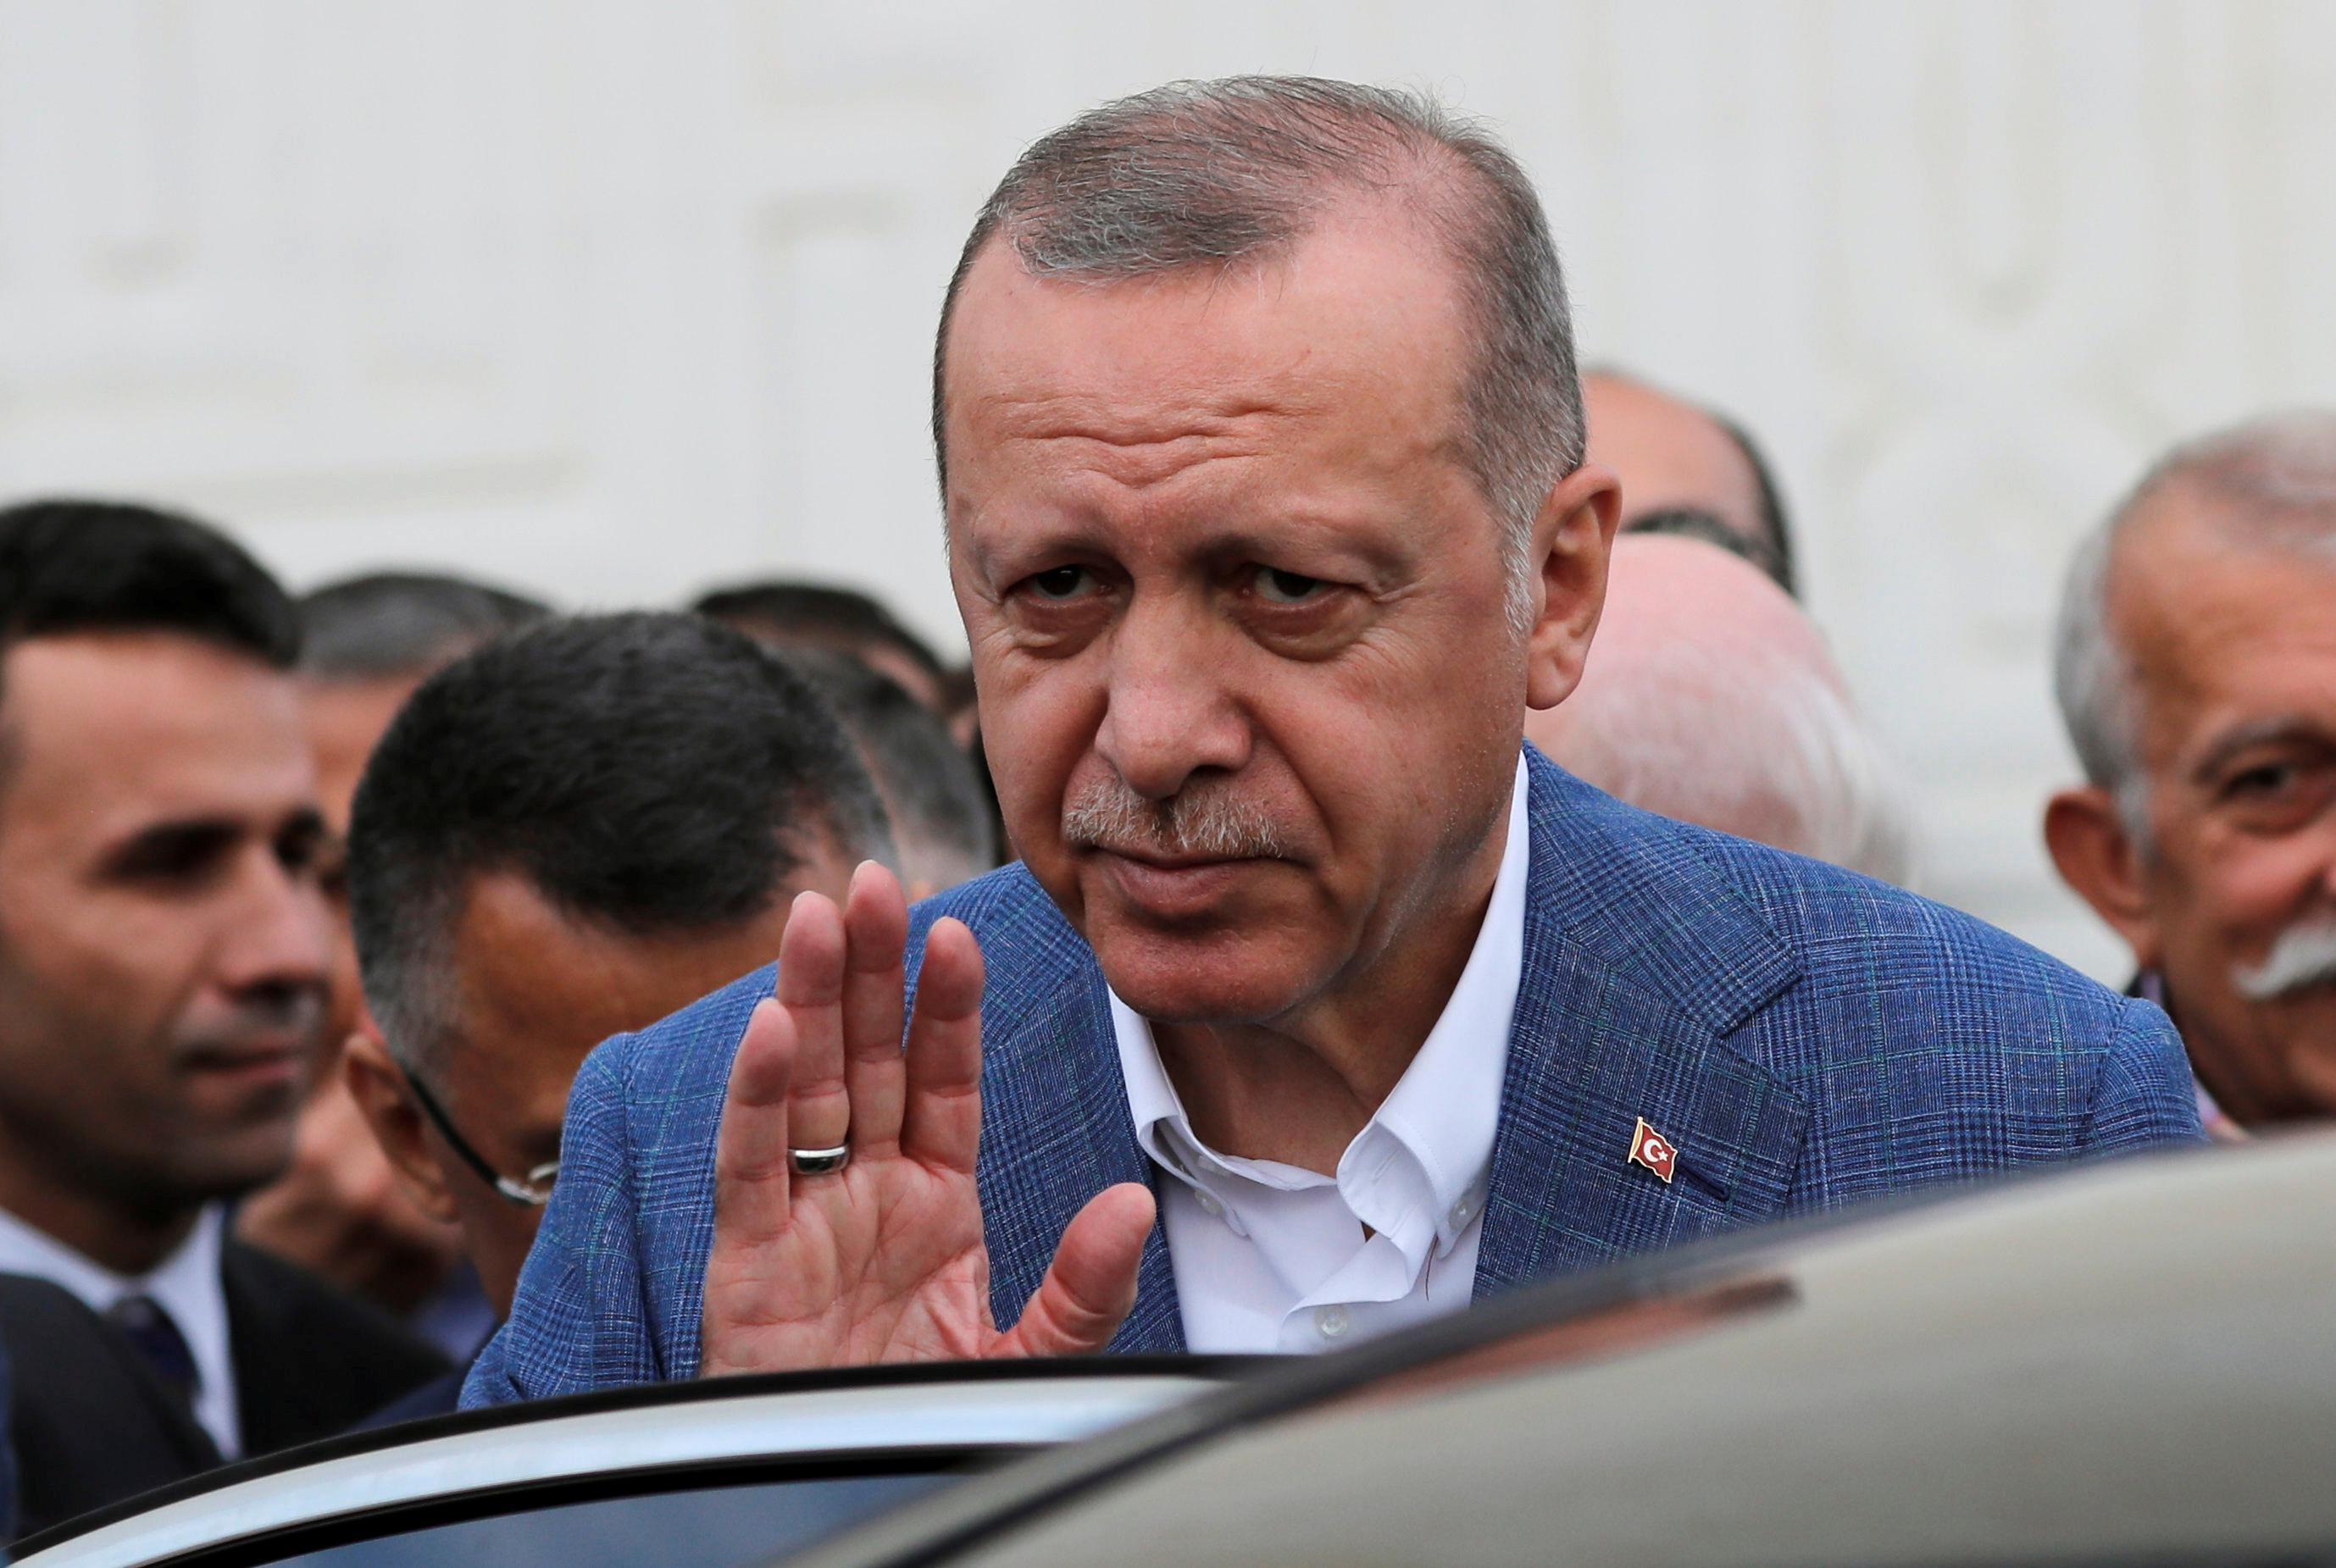 Turkey's Erdogan says Turkey has definitely bought Russian S-400 defense system